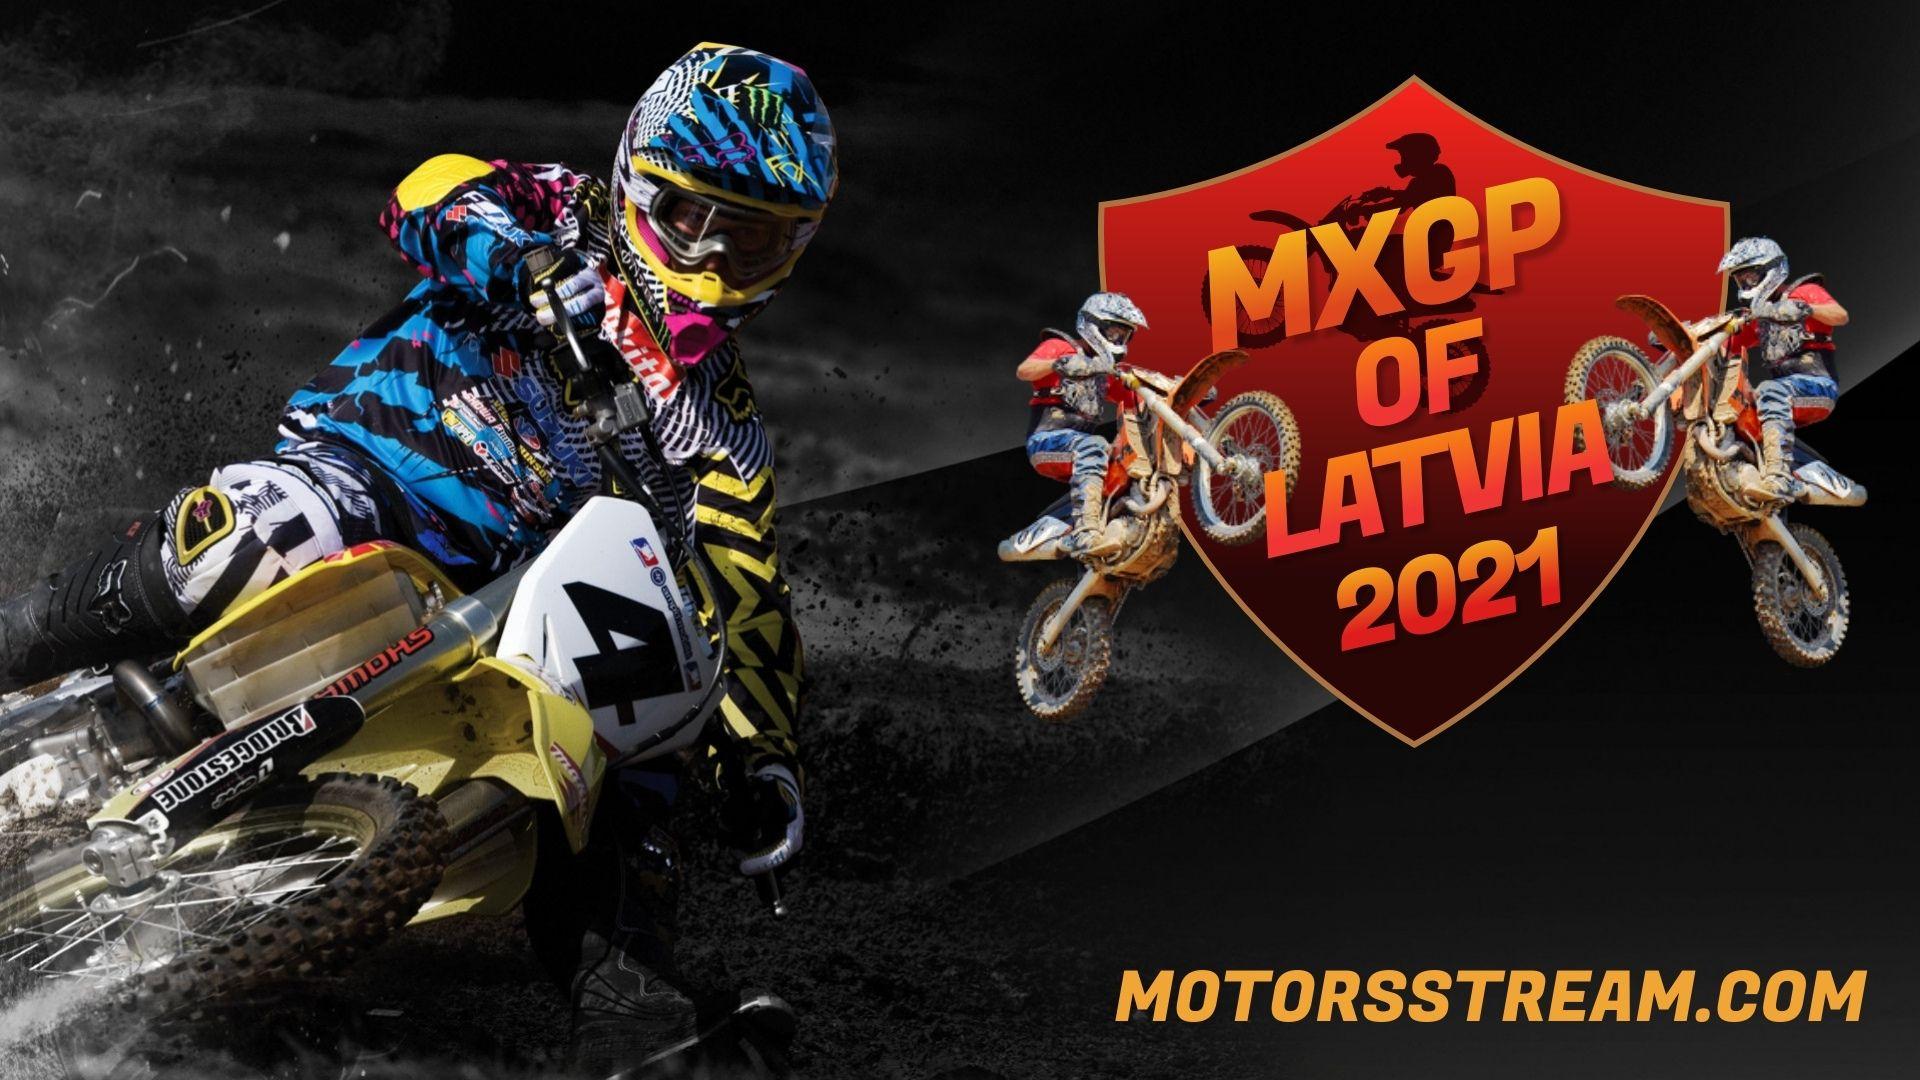 FIM Motocross WC Latvia Live Stream 2021 | MXGP